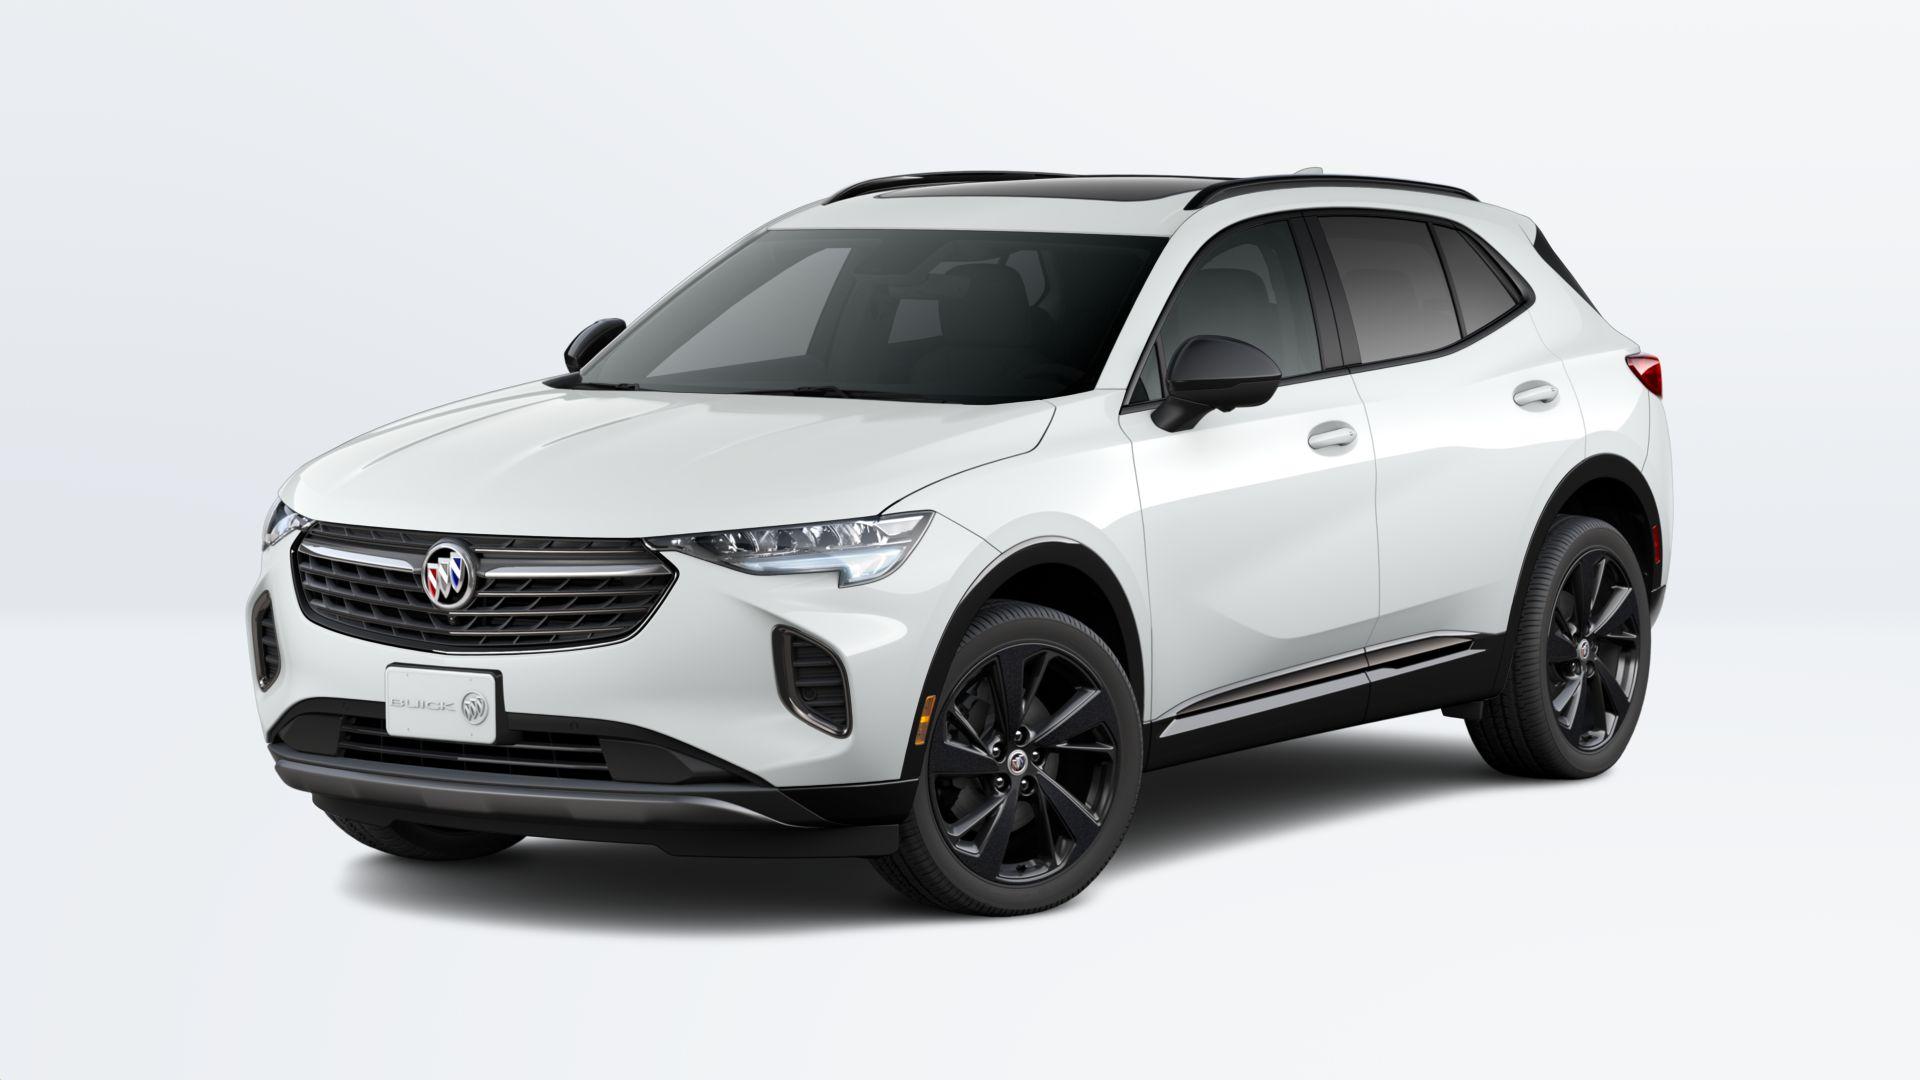 2021 Buick Envision SUV